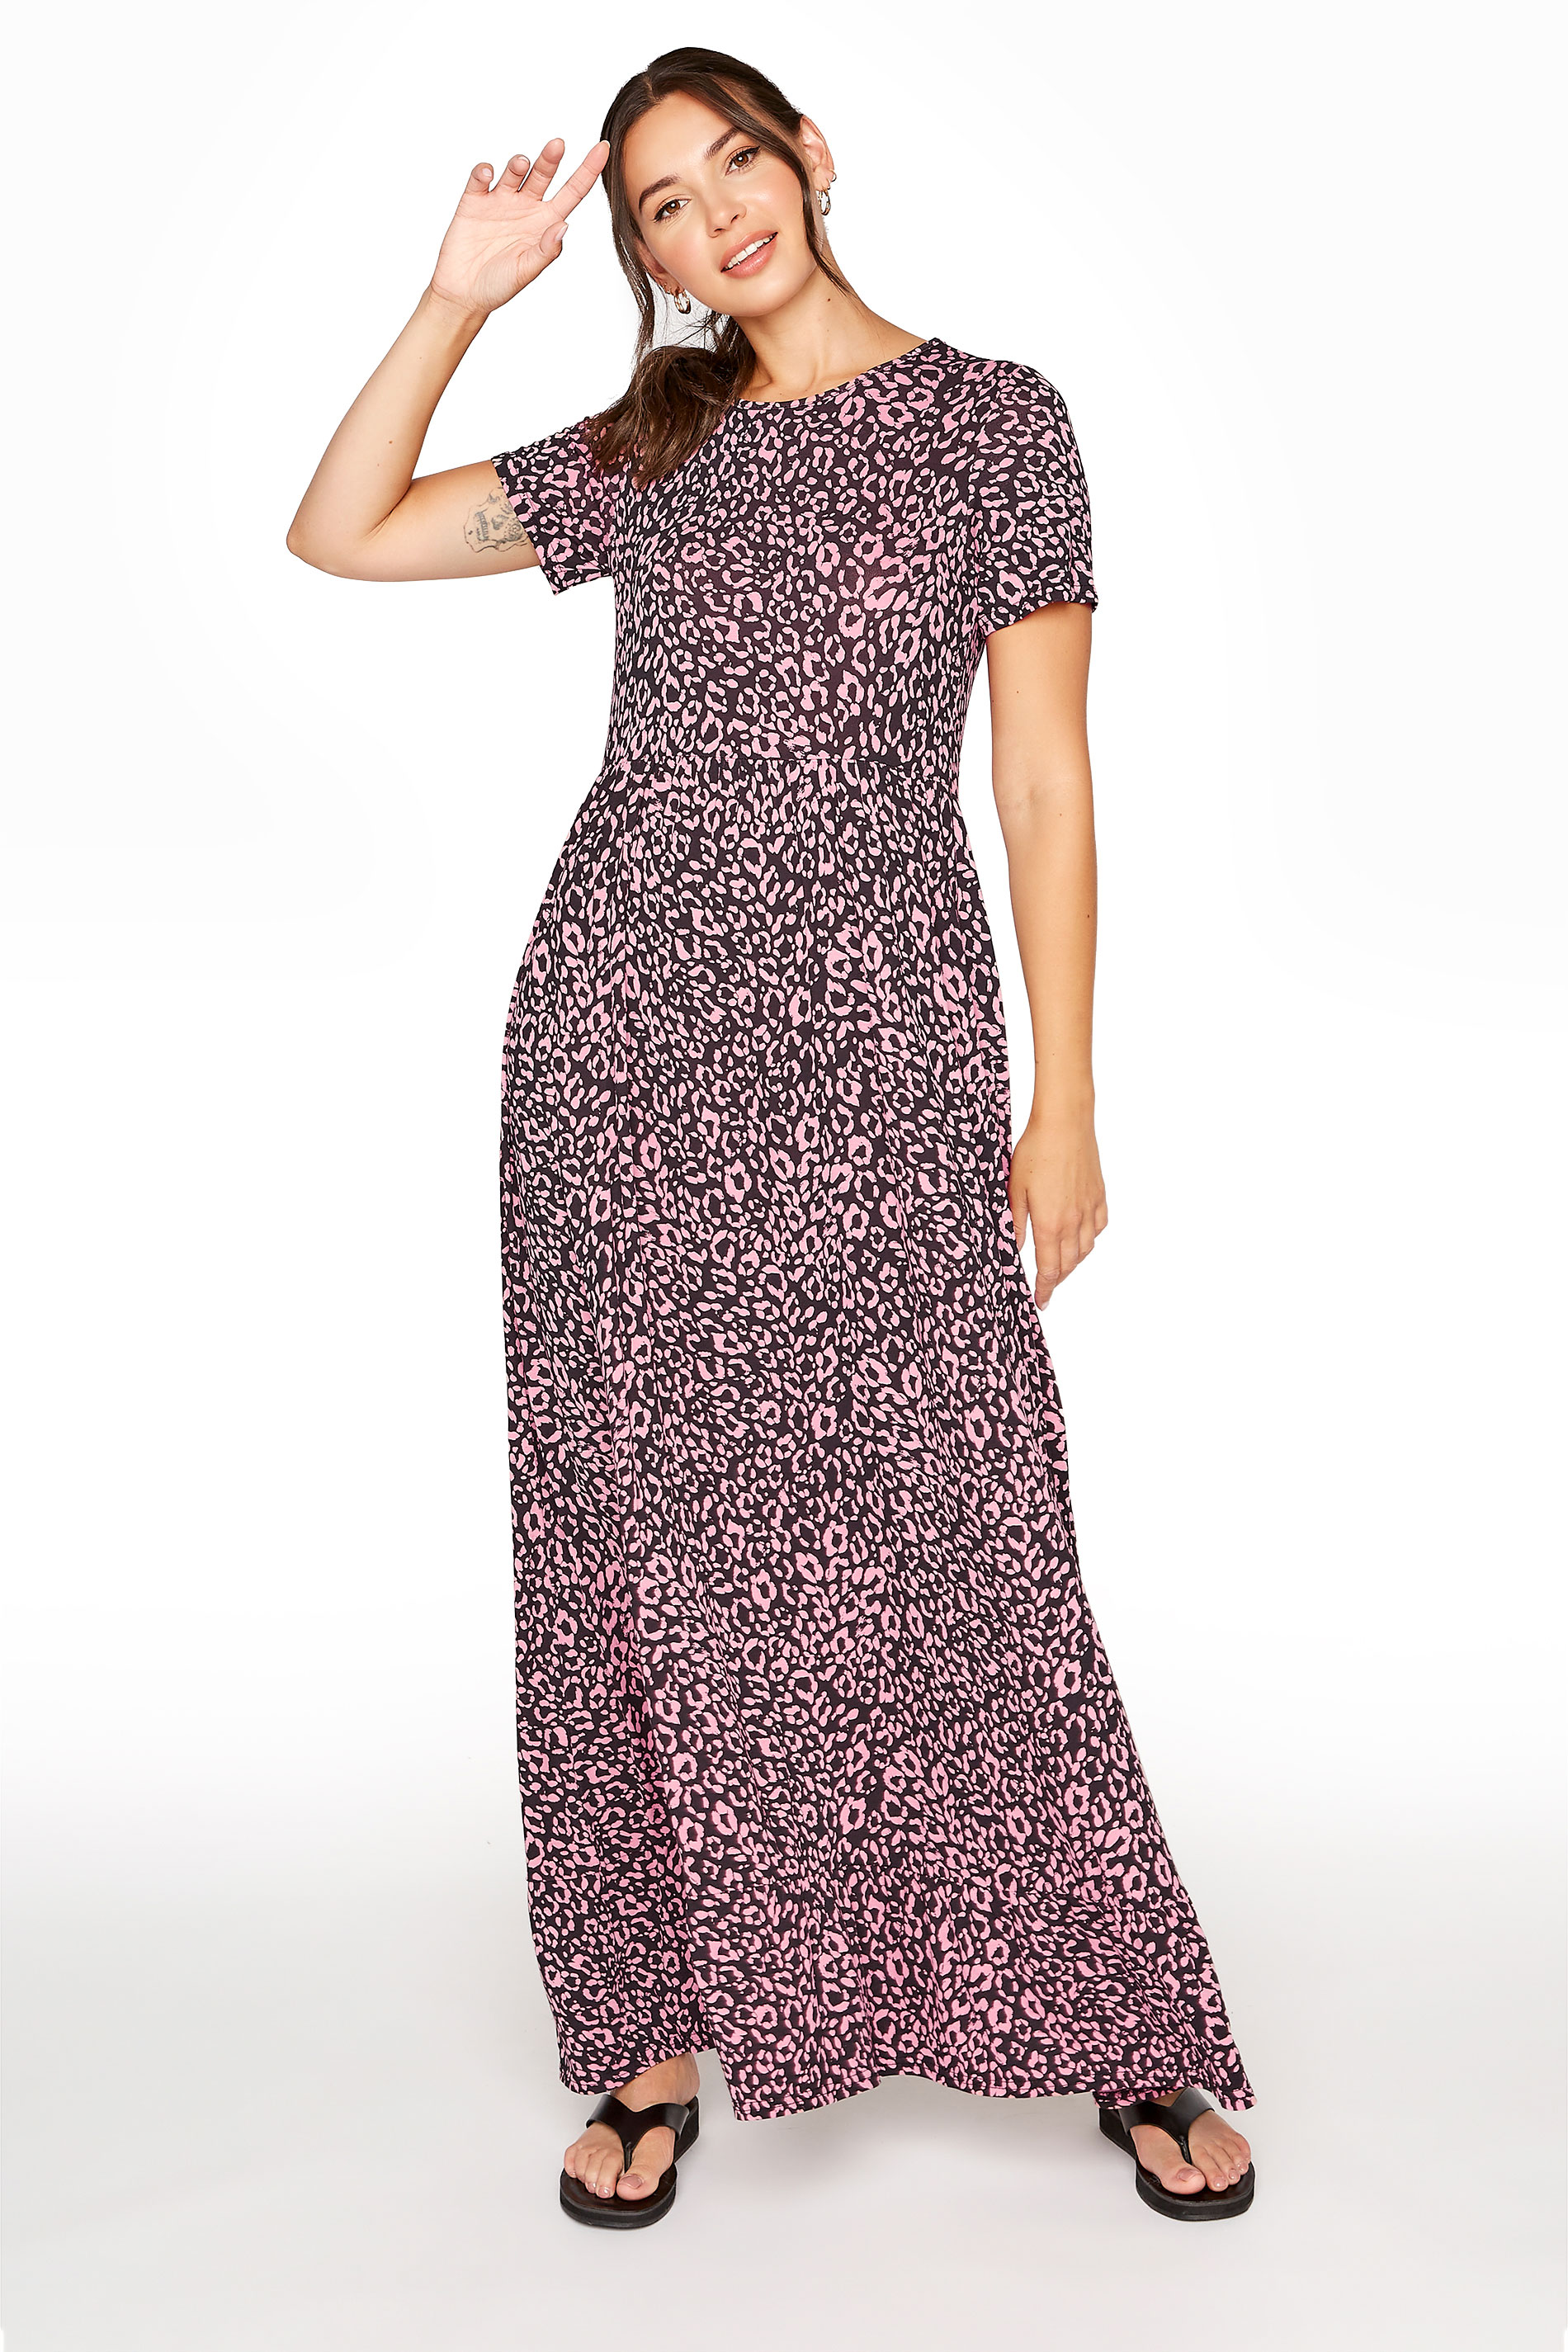 LTS Pink Animal Print Tiered Midaxi Dress_A.jpg